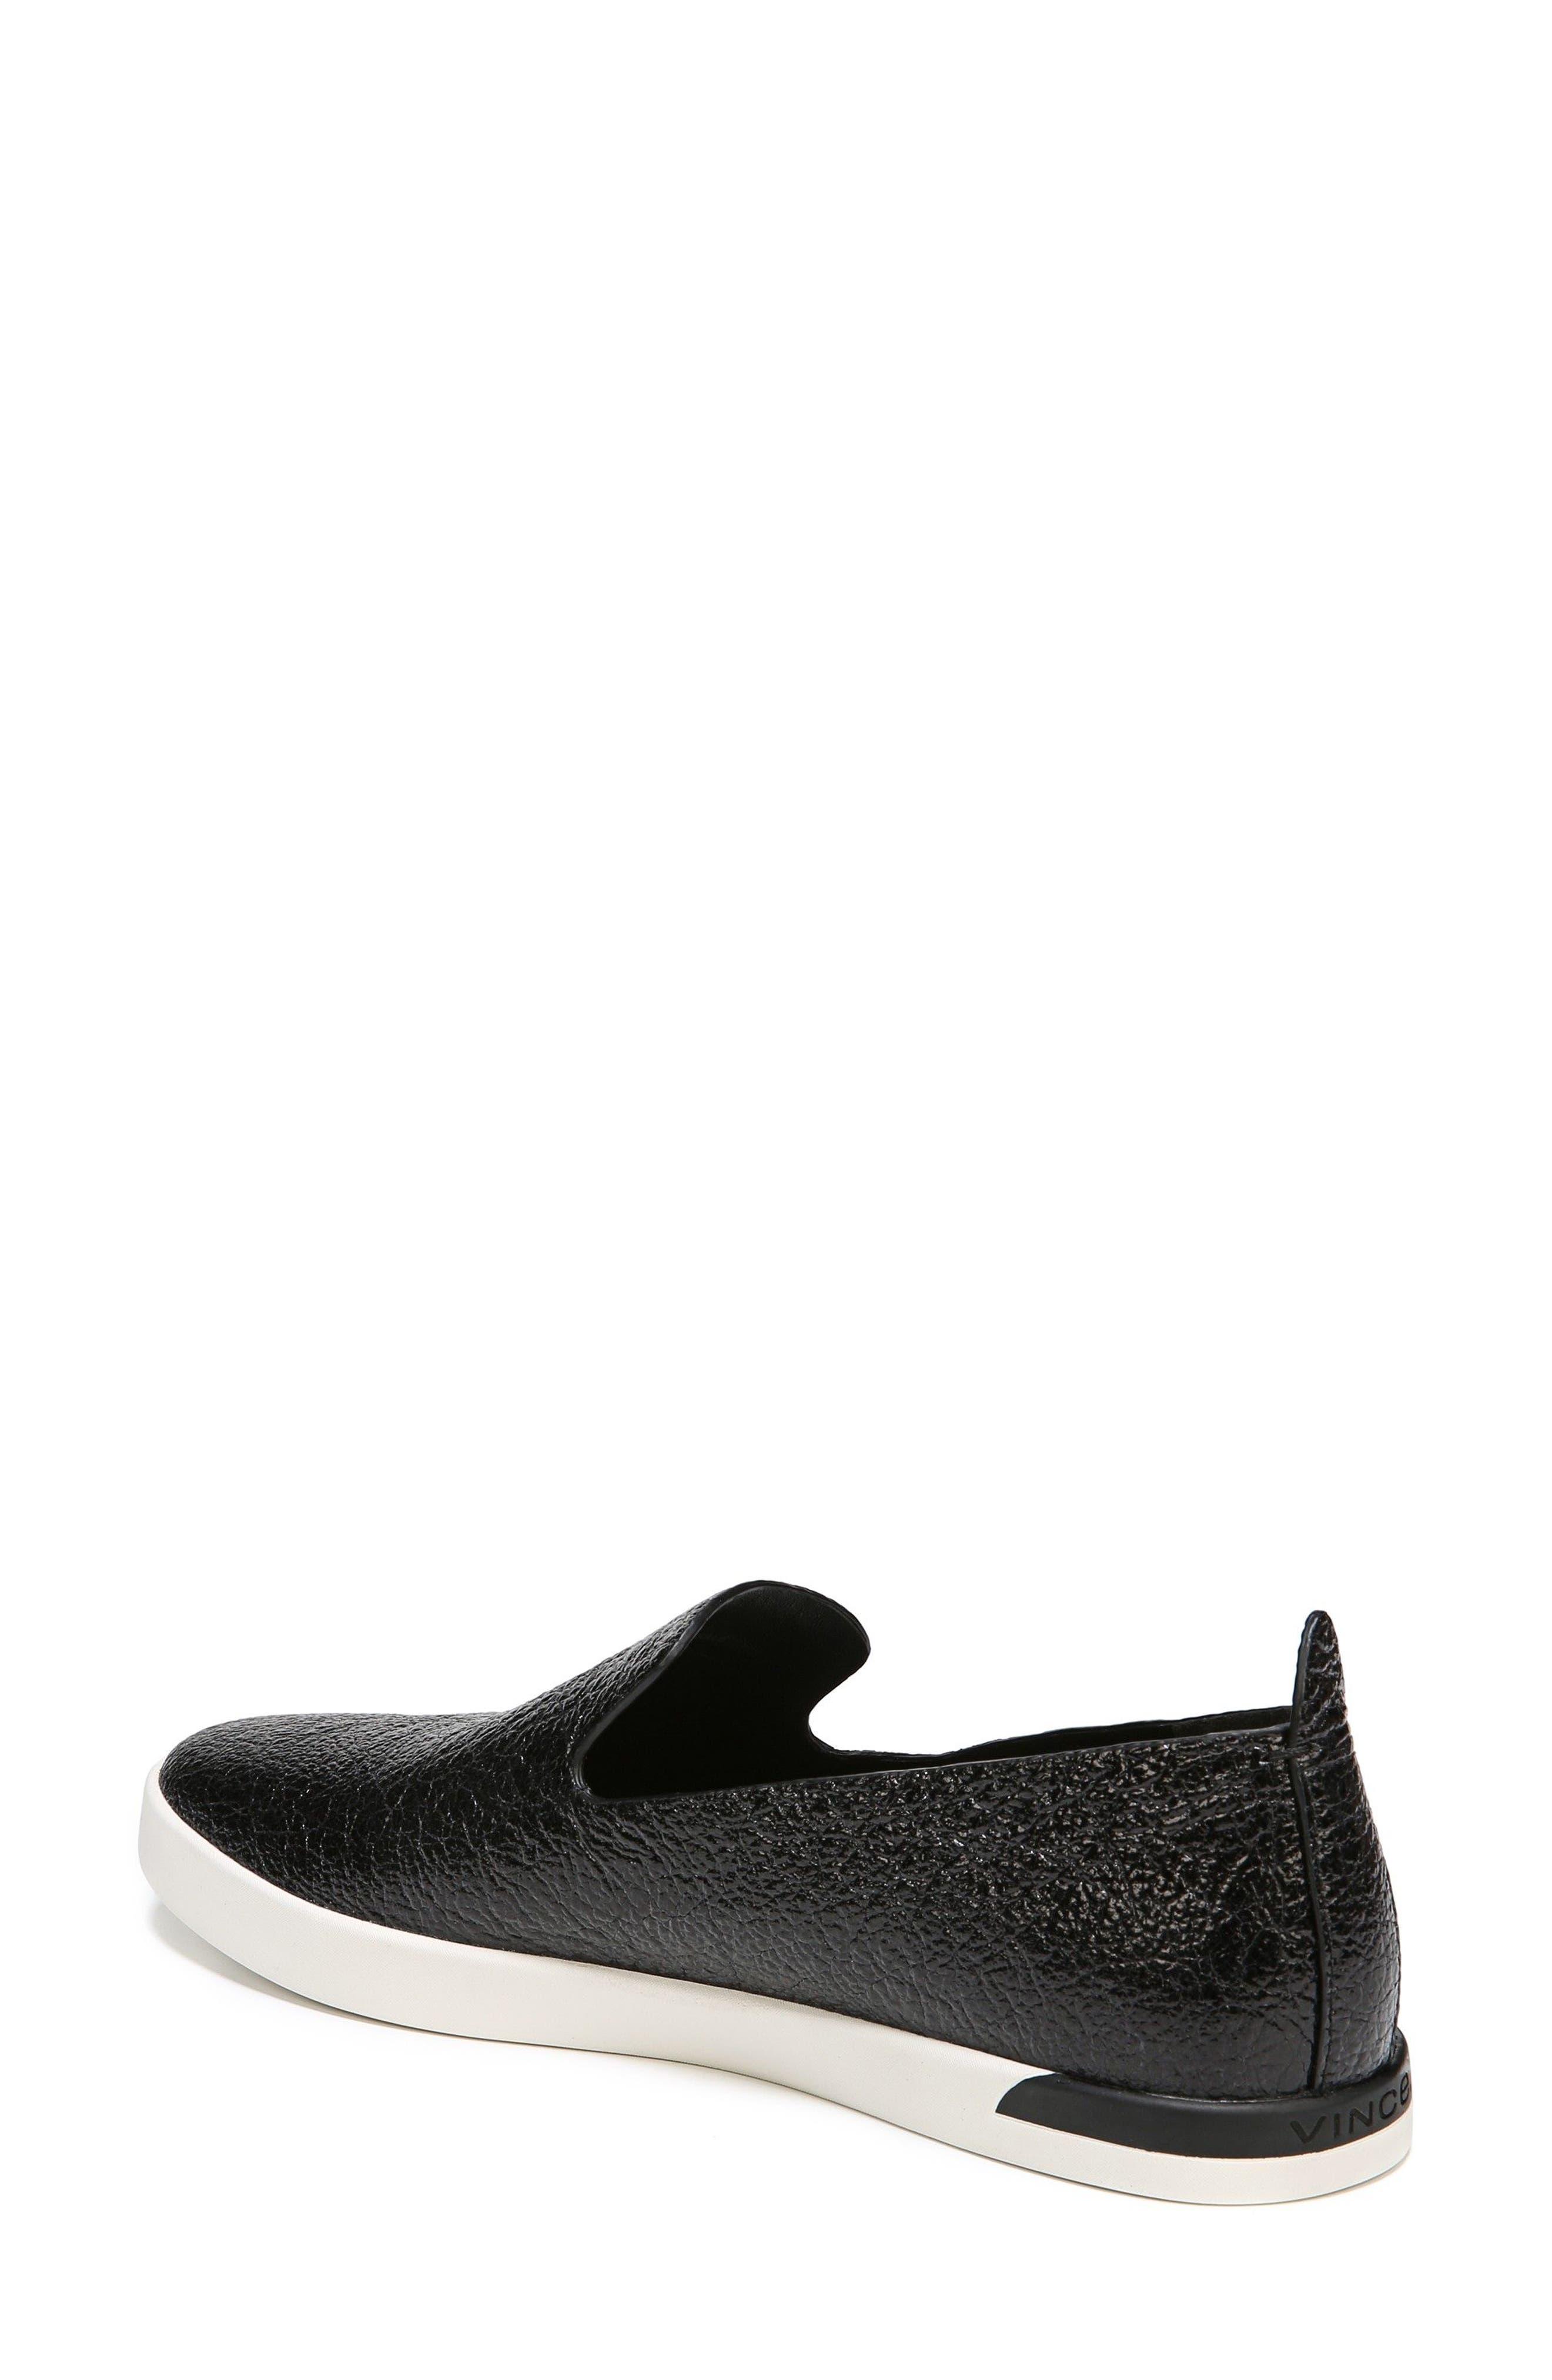 Vero Sneaker,                             Alternate thumbnail 2, color,                             003